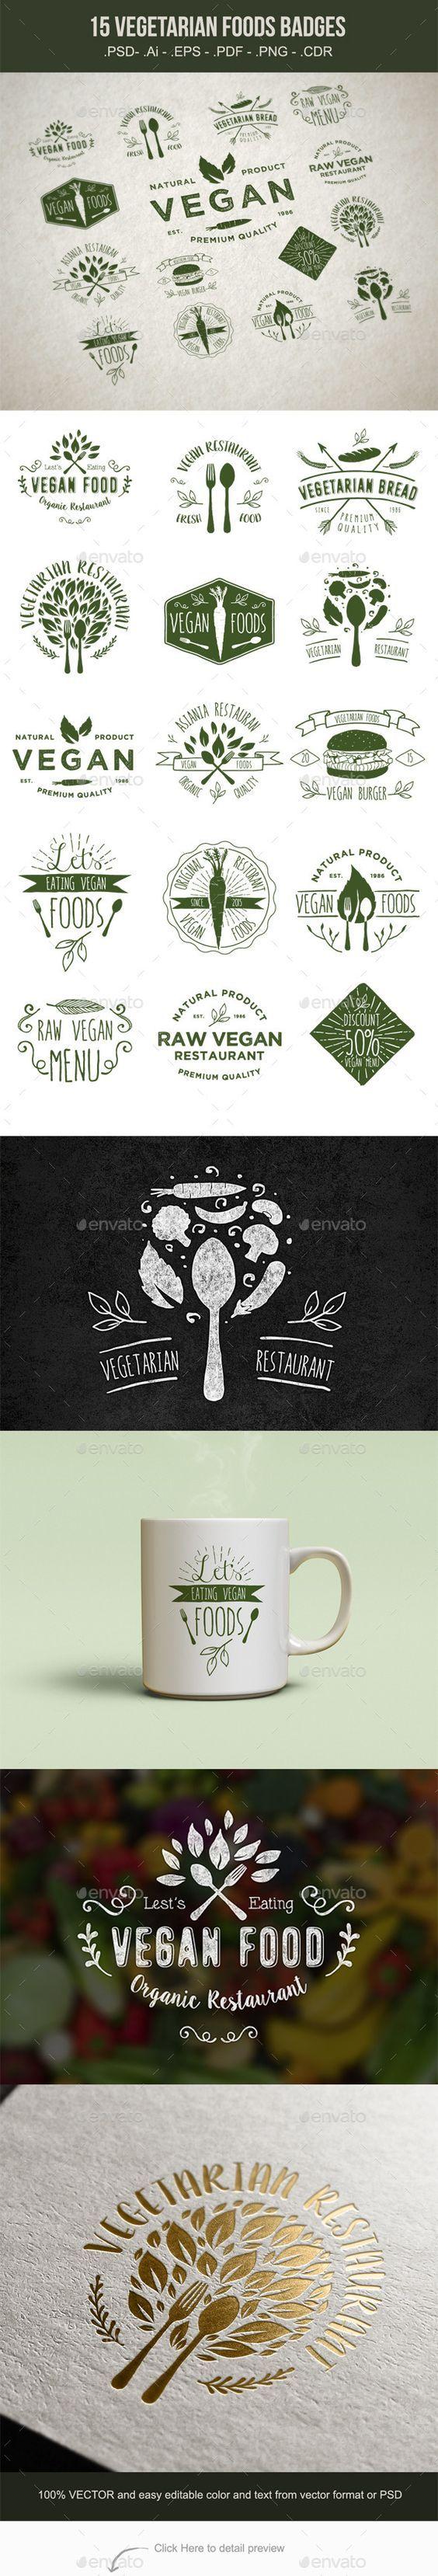 15 Vegetarian Foods Badges Vector Template #design Download: http://graphicriver.net/item/15-vegetarian-foods-badges/11184810?ref=ksioks: